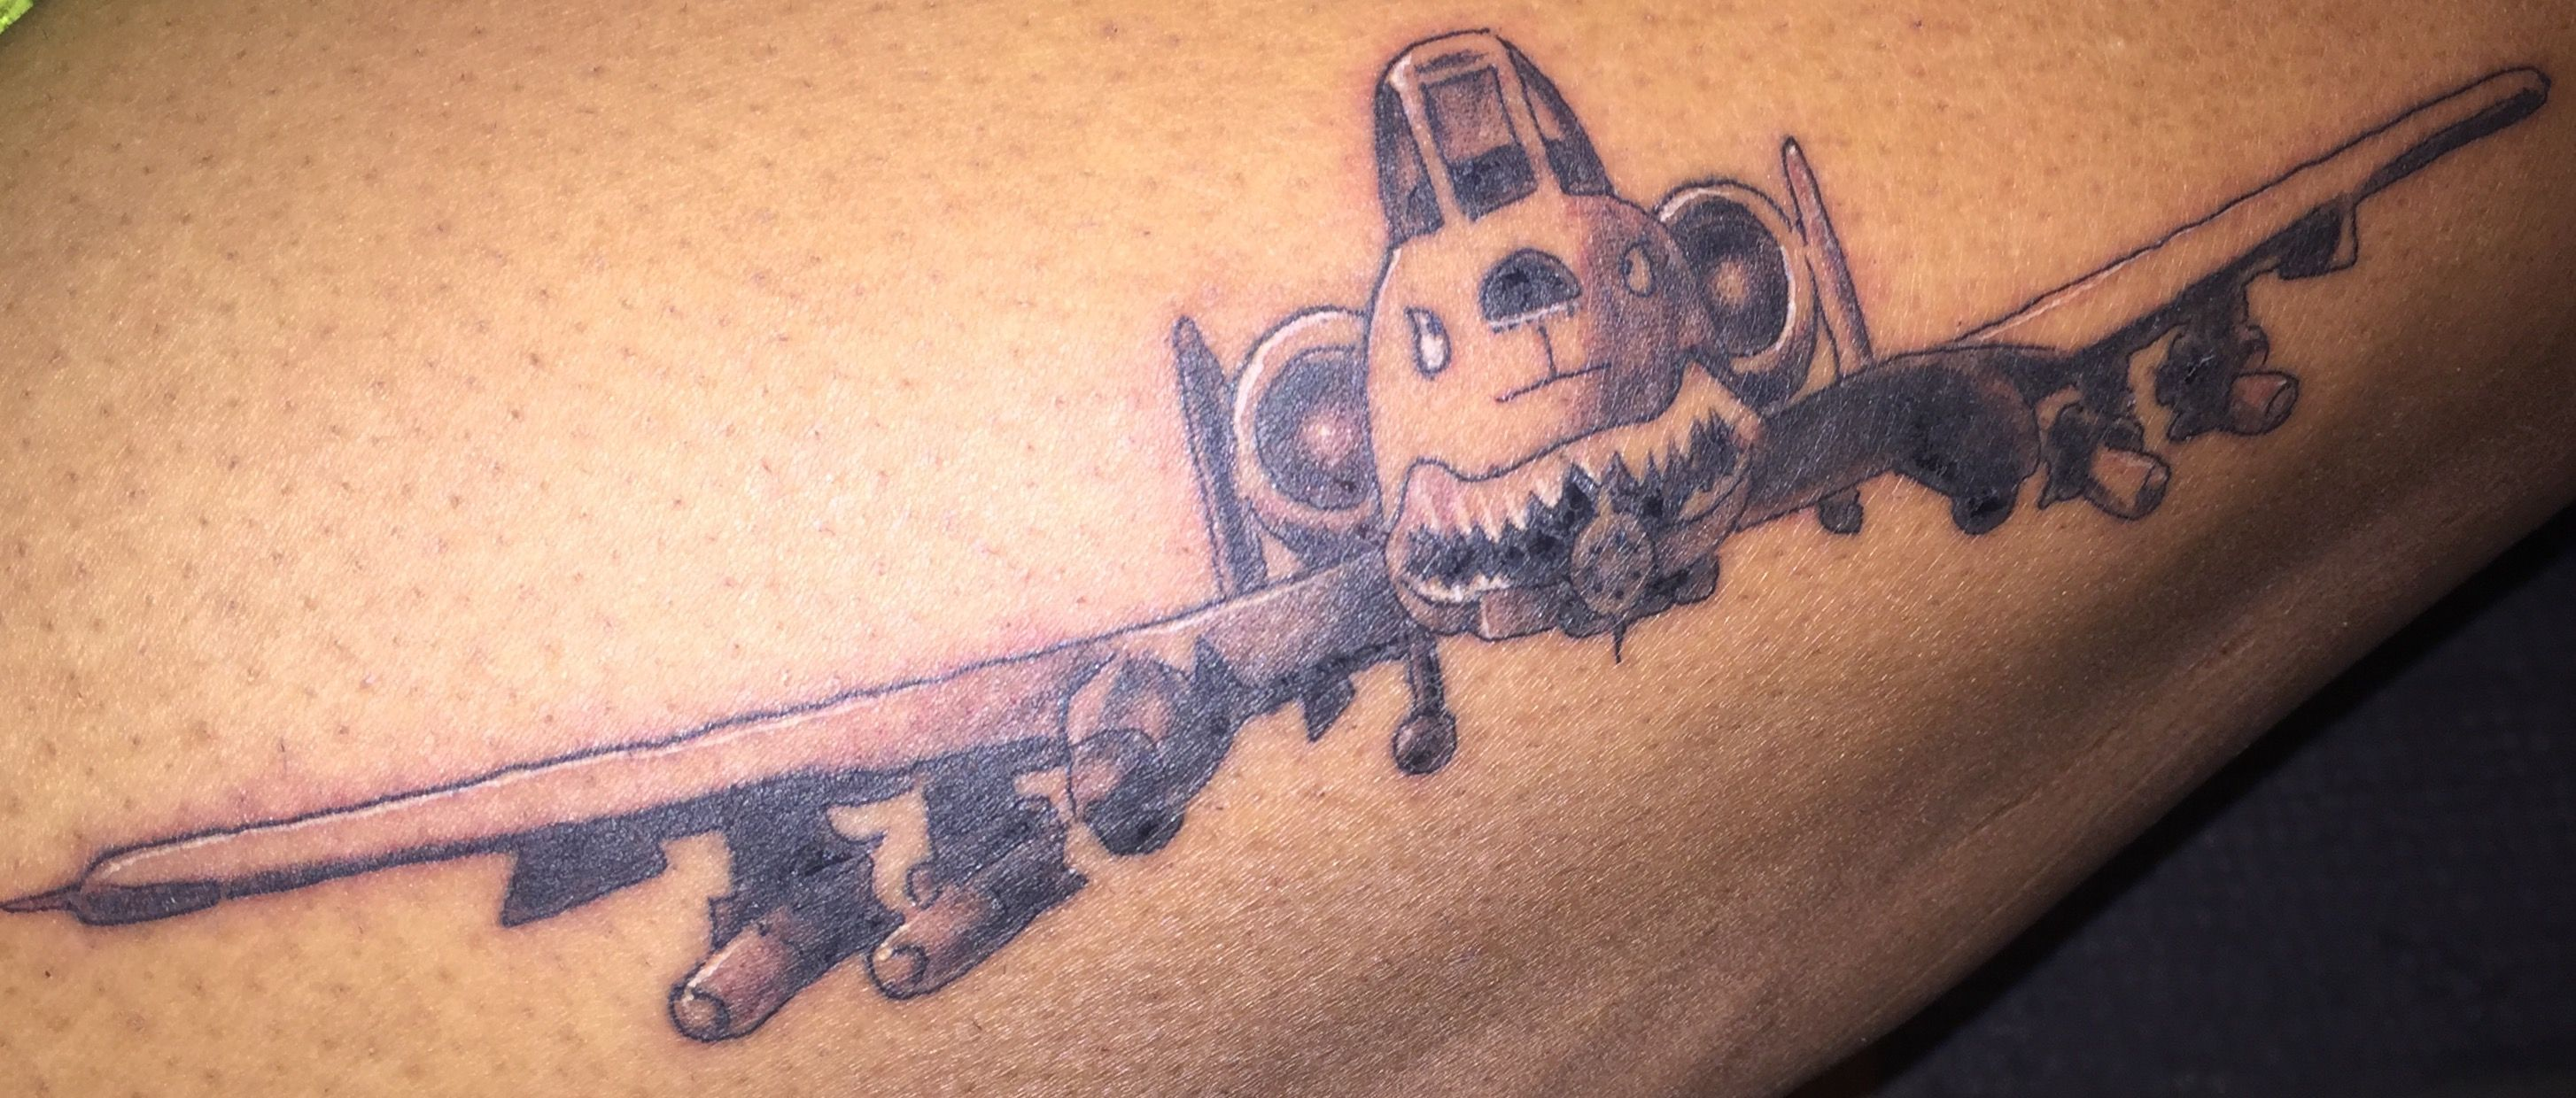 895315f79 A-10 warthog tattoo | Tatted up <3 | Tattoos, A10 warthog, Piercings